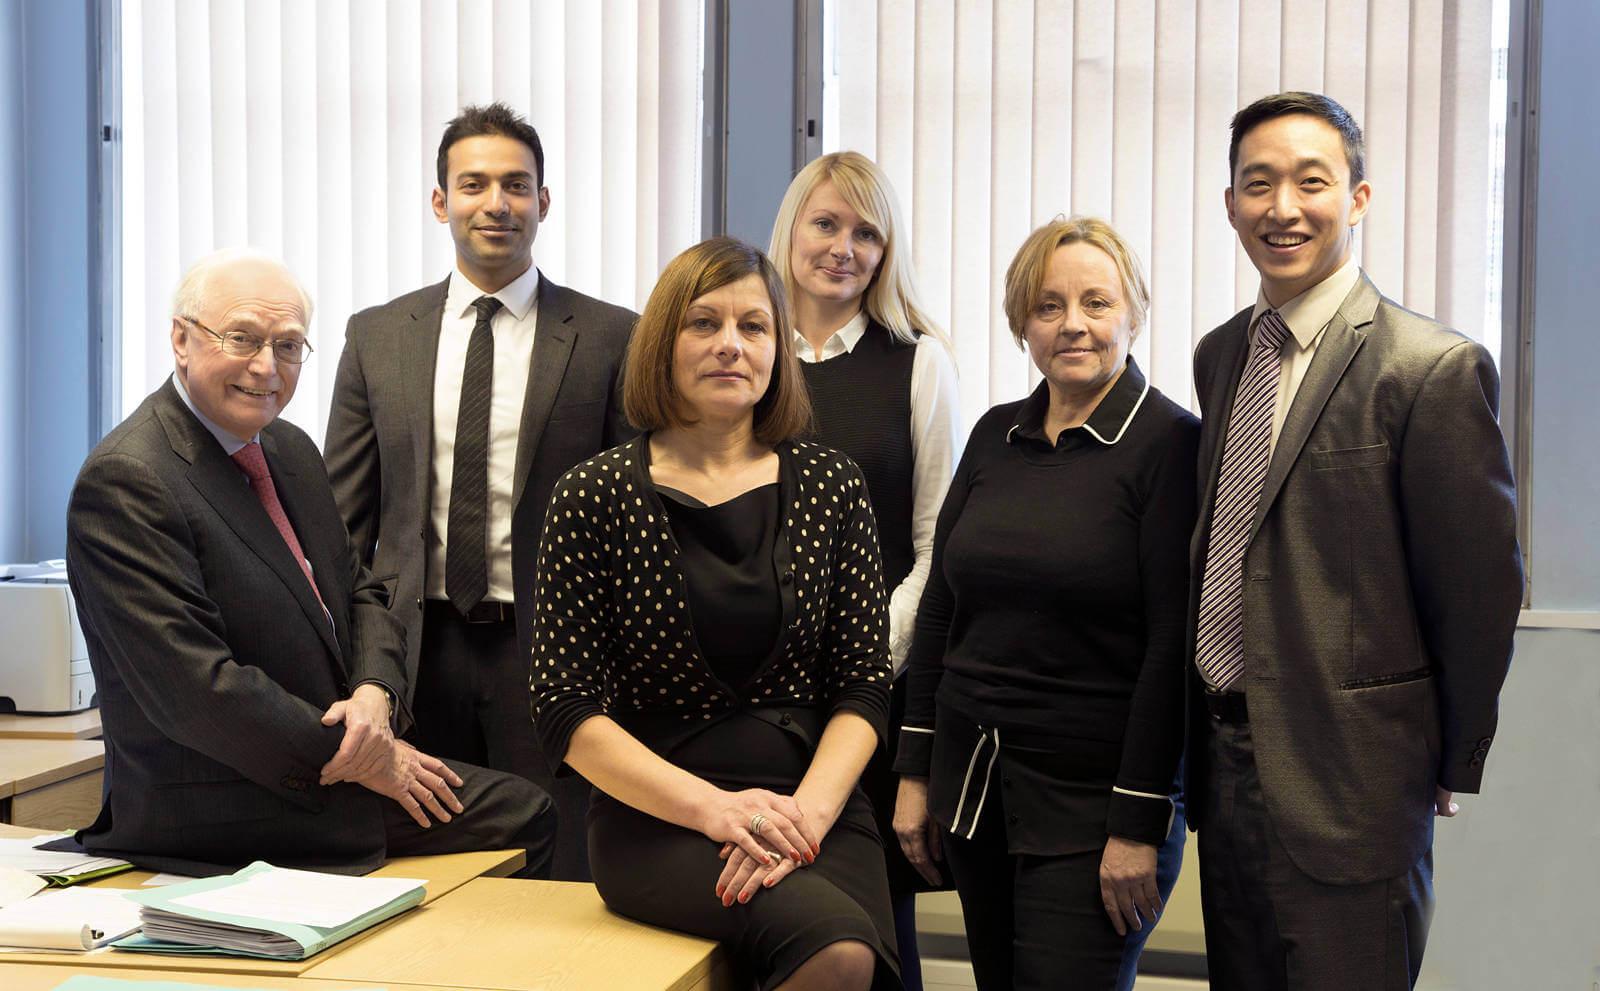 Accountants Tooting, Hammonds Chartered Accountants